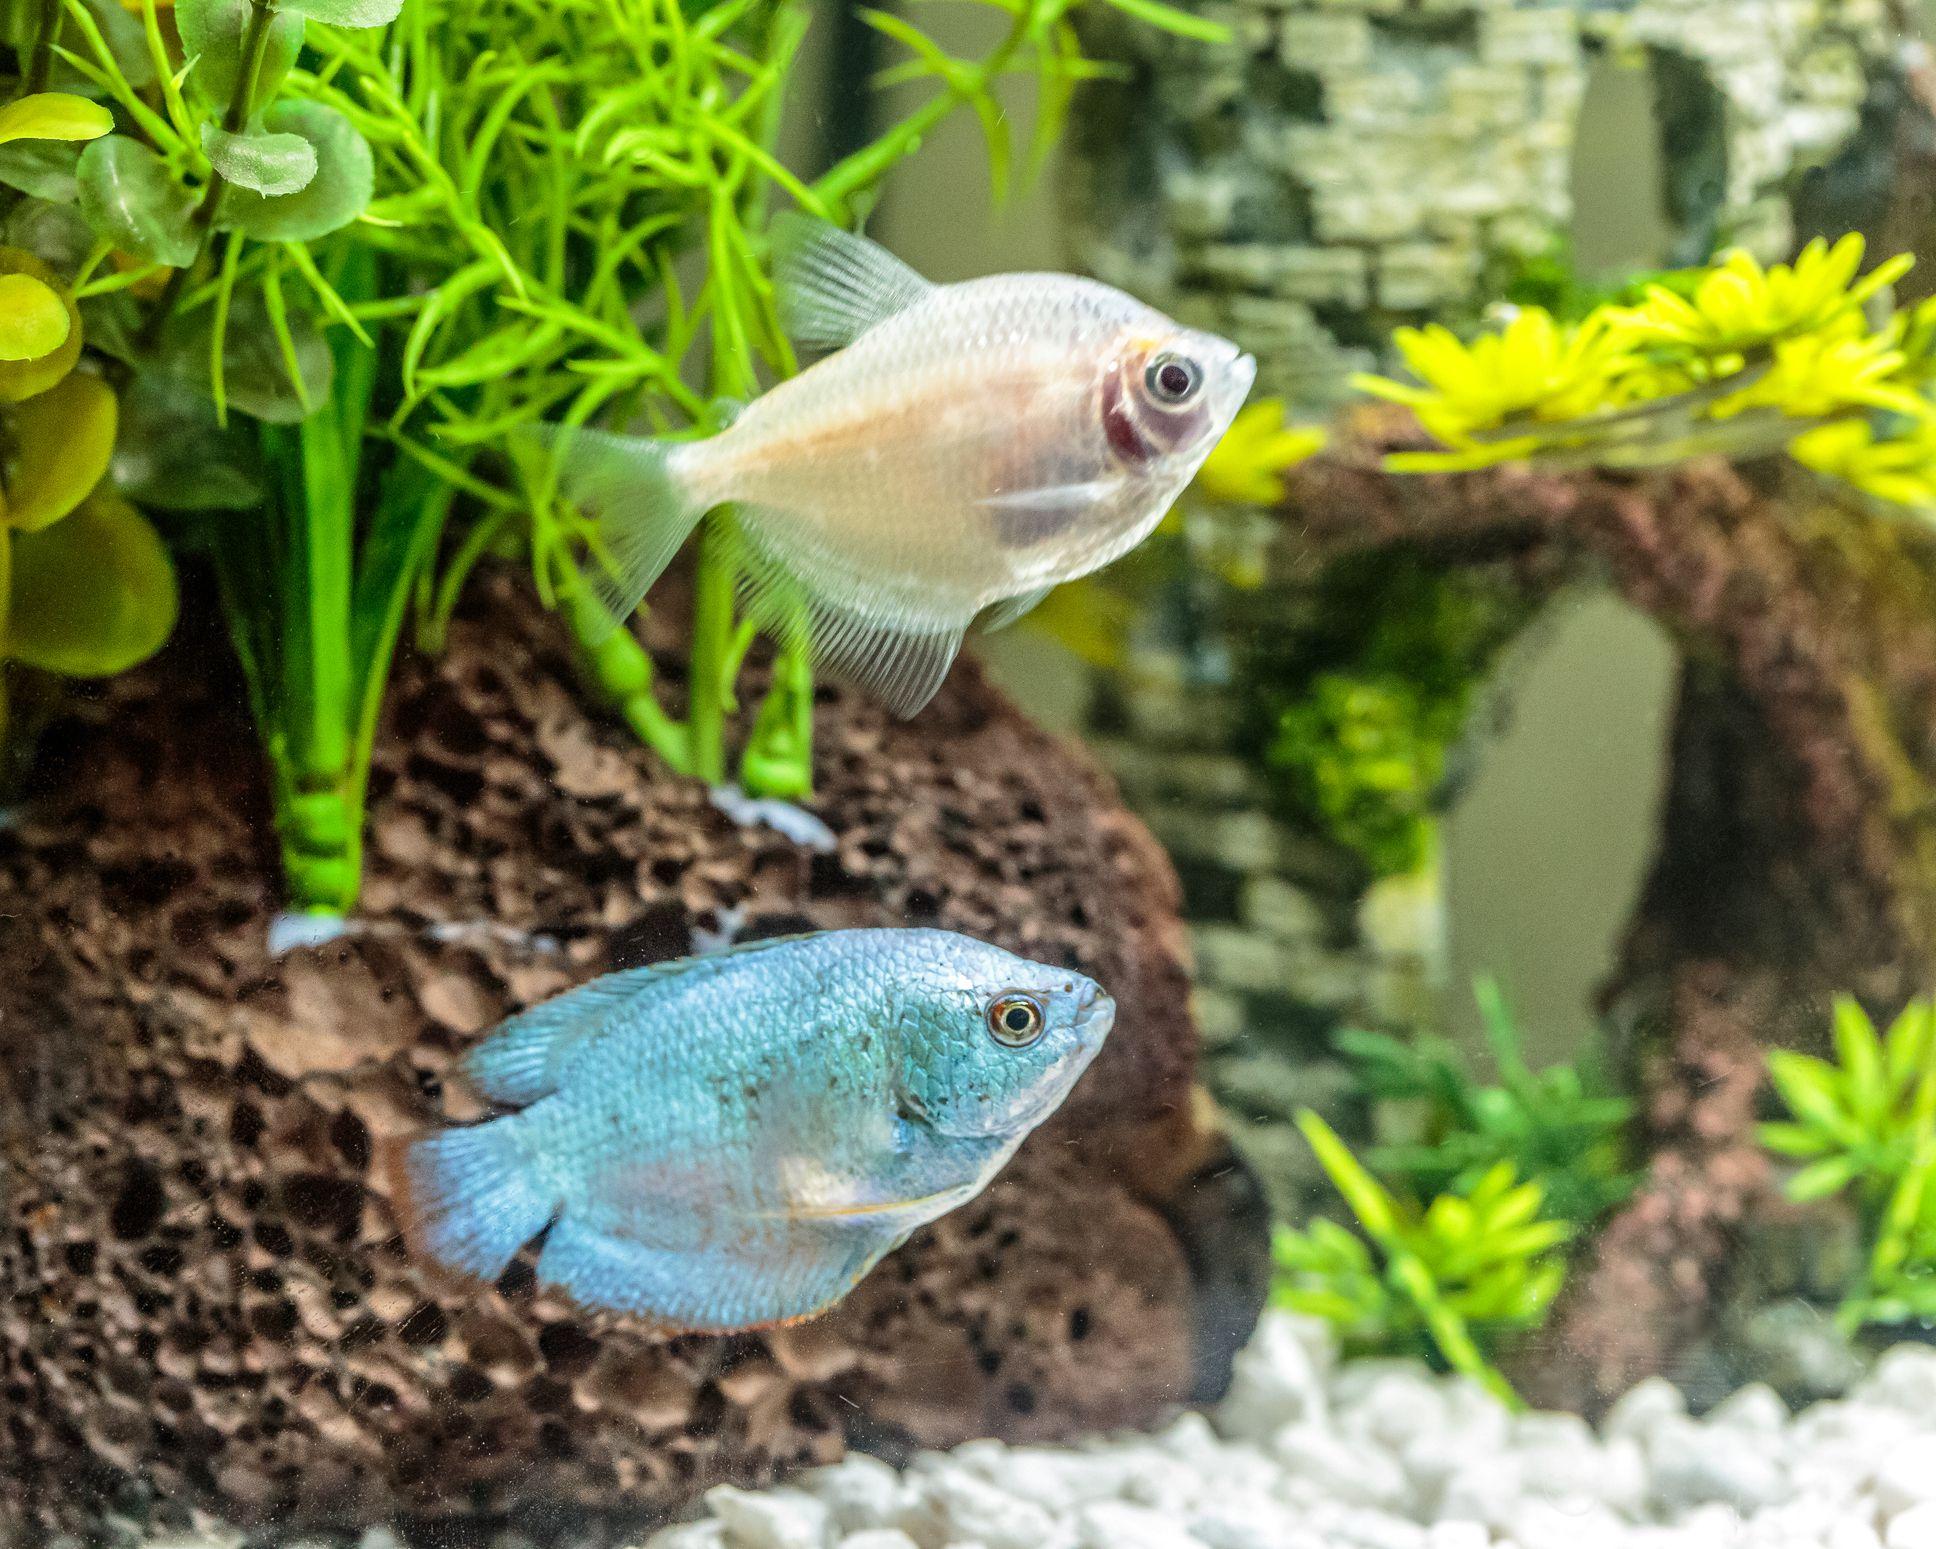 Choosing a Filtration System for a Saltwater Aquarium